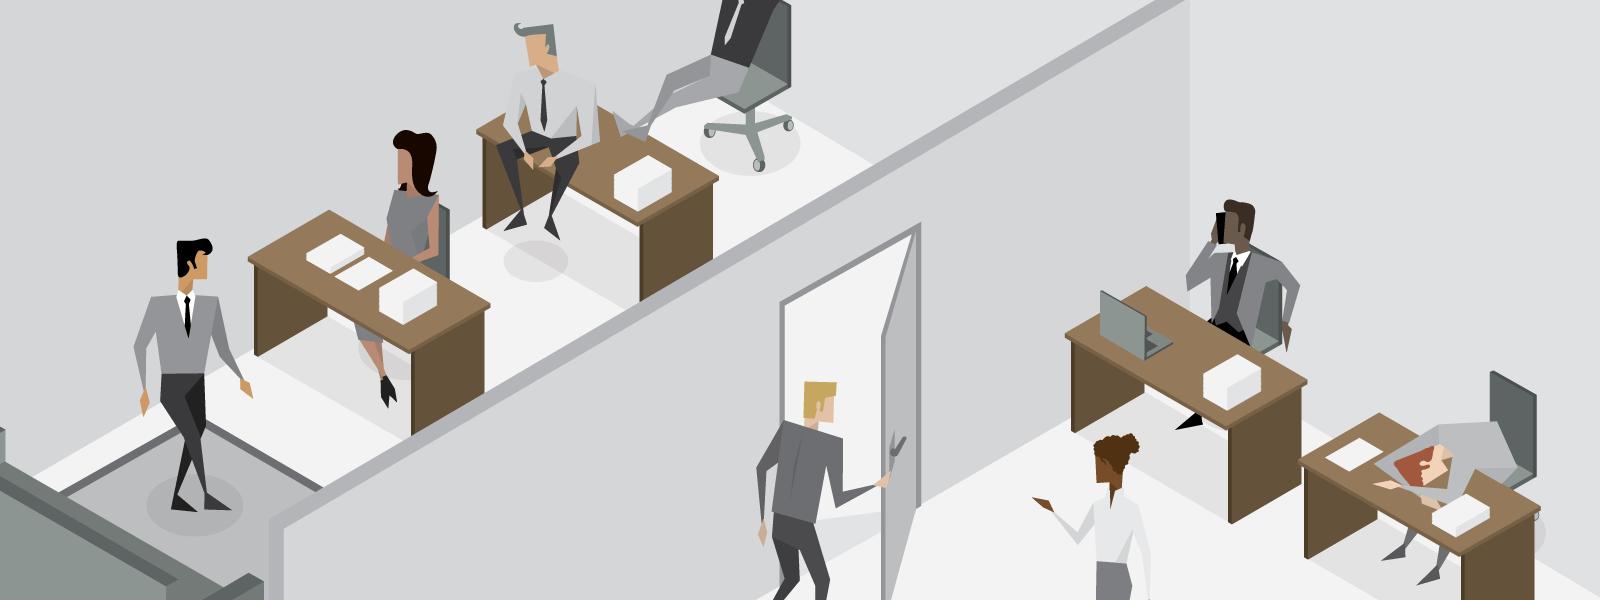 Employee disengagement